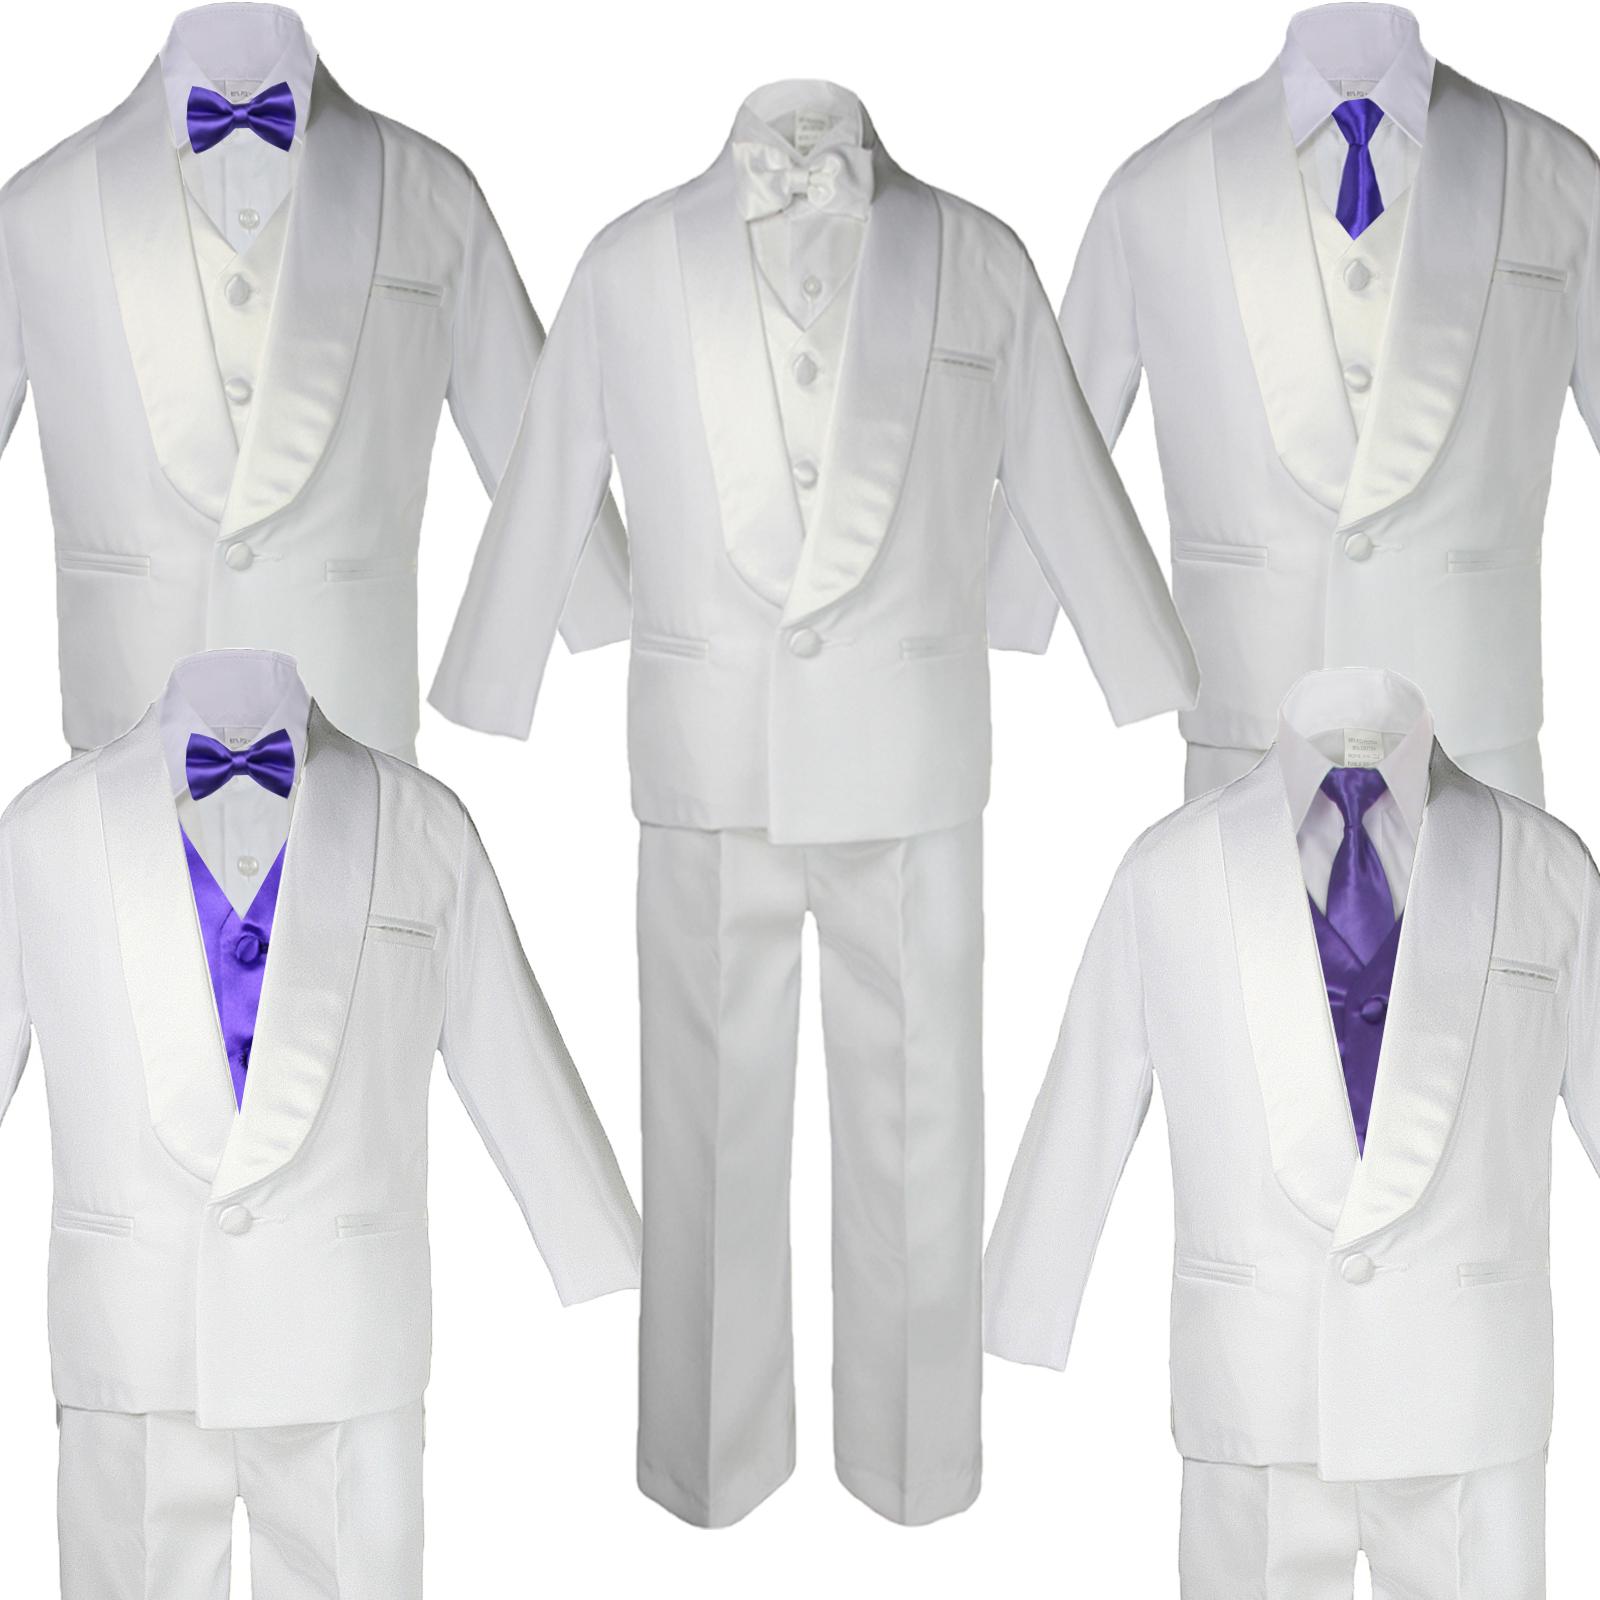 5-7pc BABY BOY White Formal Shawl Lapel Suit Tuxedo GOLD Satin Bow Necktie Vest